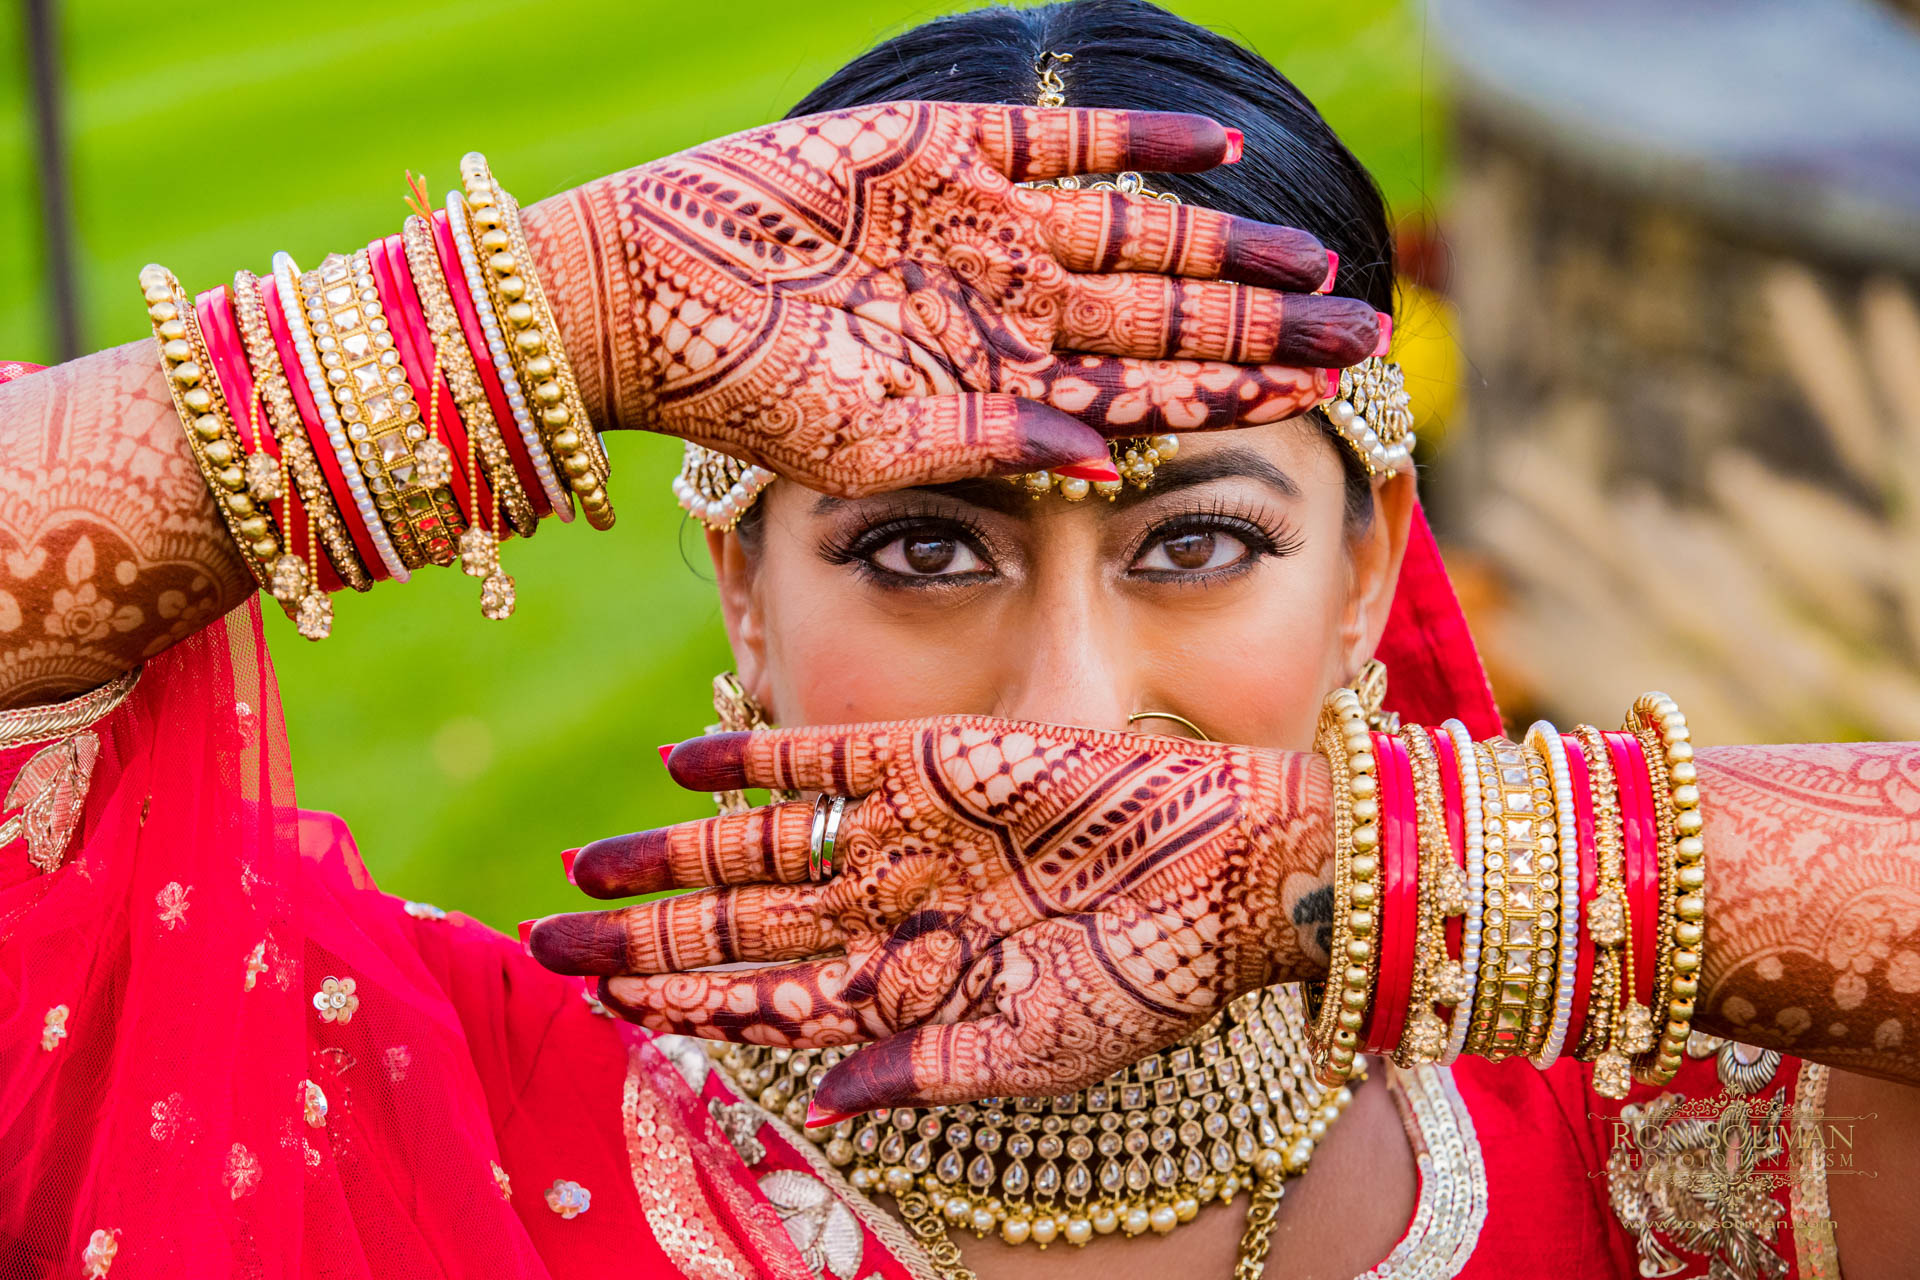 BROOKLAKE COUNTRY CLUB INDIAN WEDDING 15